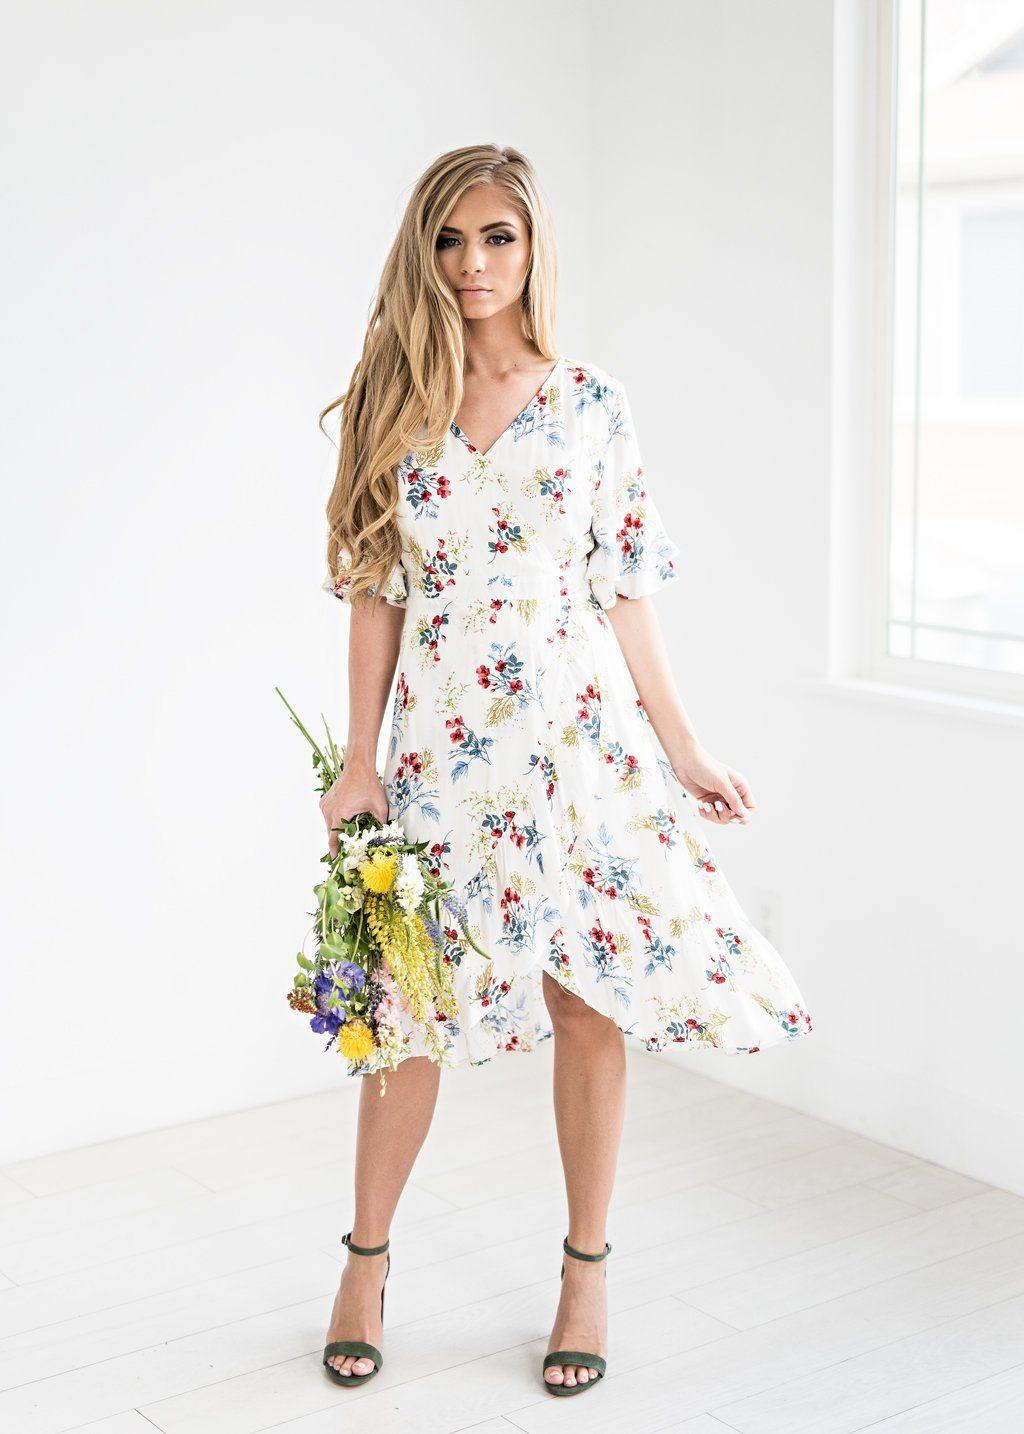 Penny Lane Floral Dress Modest Dress Modest Dresses Bridesmaid Modest Floral Dress Modest Date Night Church D Modest Floral Dress Modest Dresses Dresses [ 1434 x 1024 Pixel ]